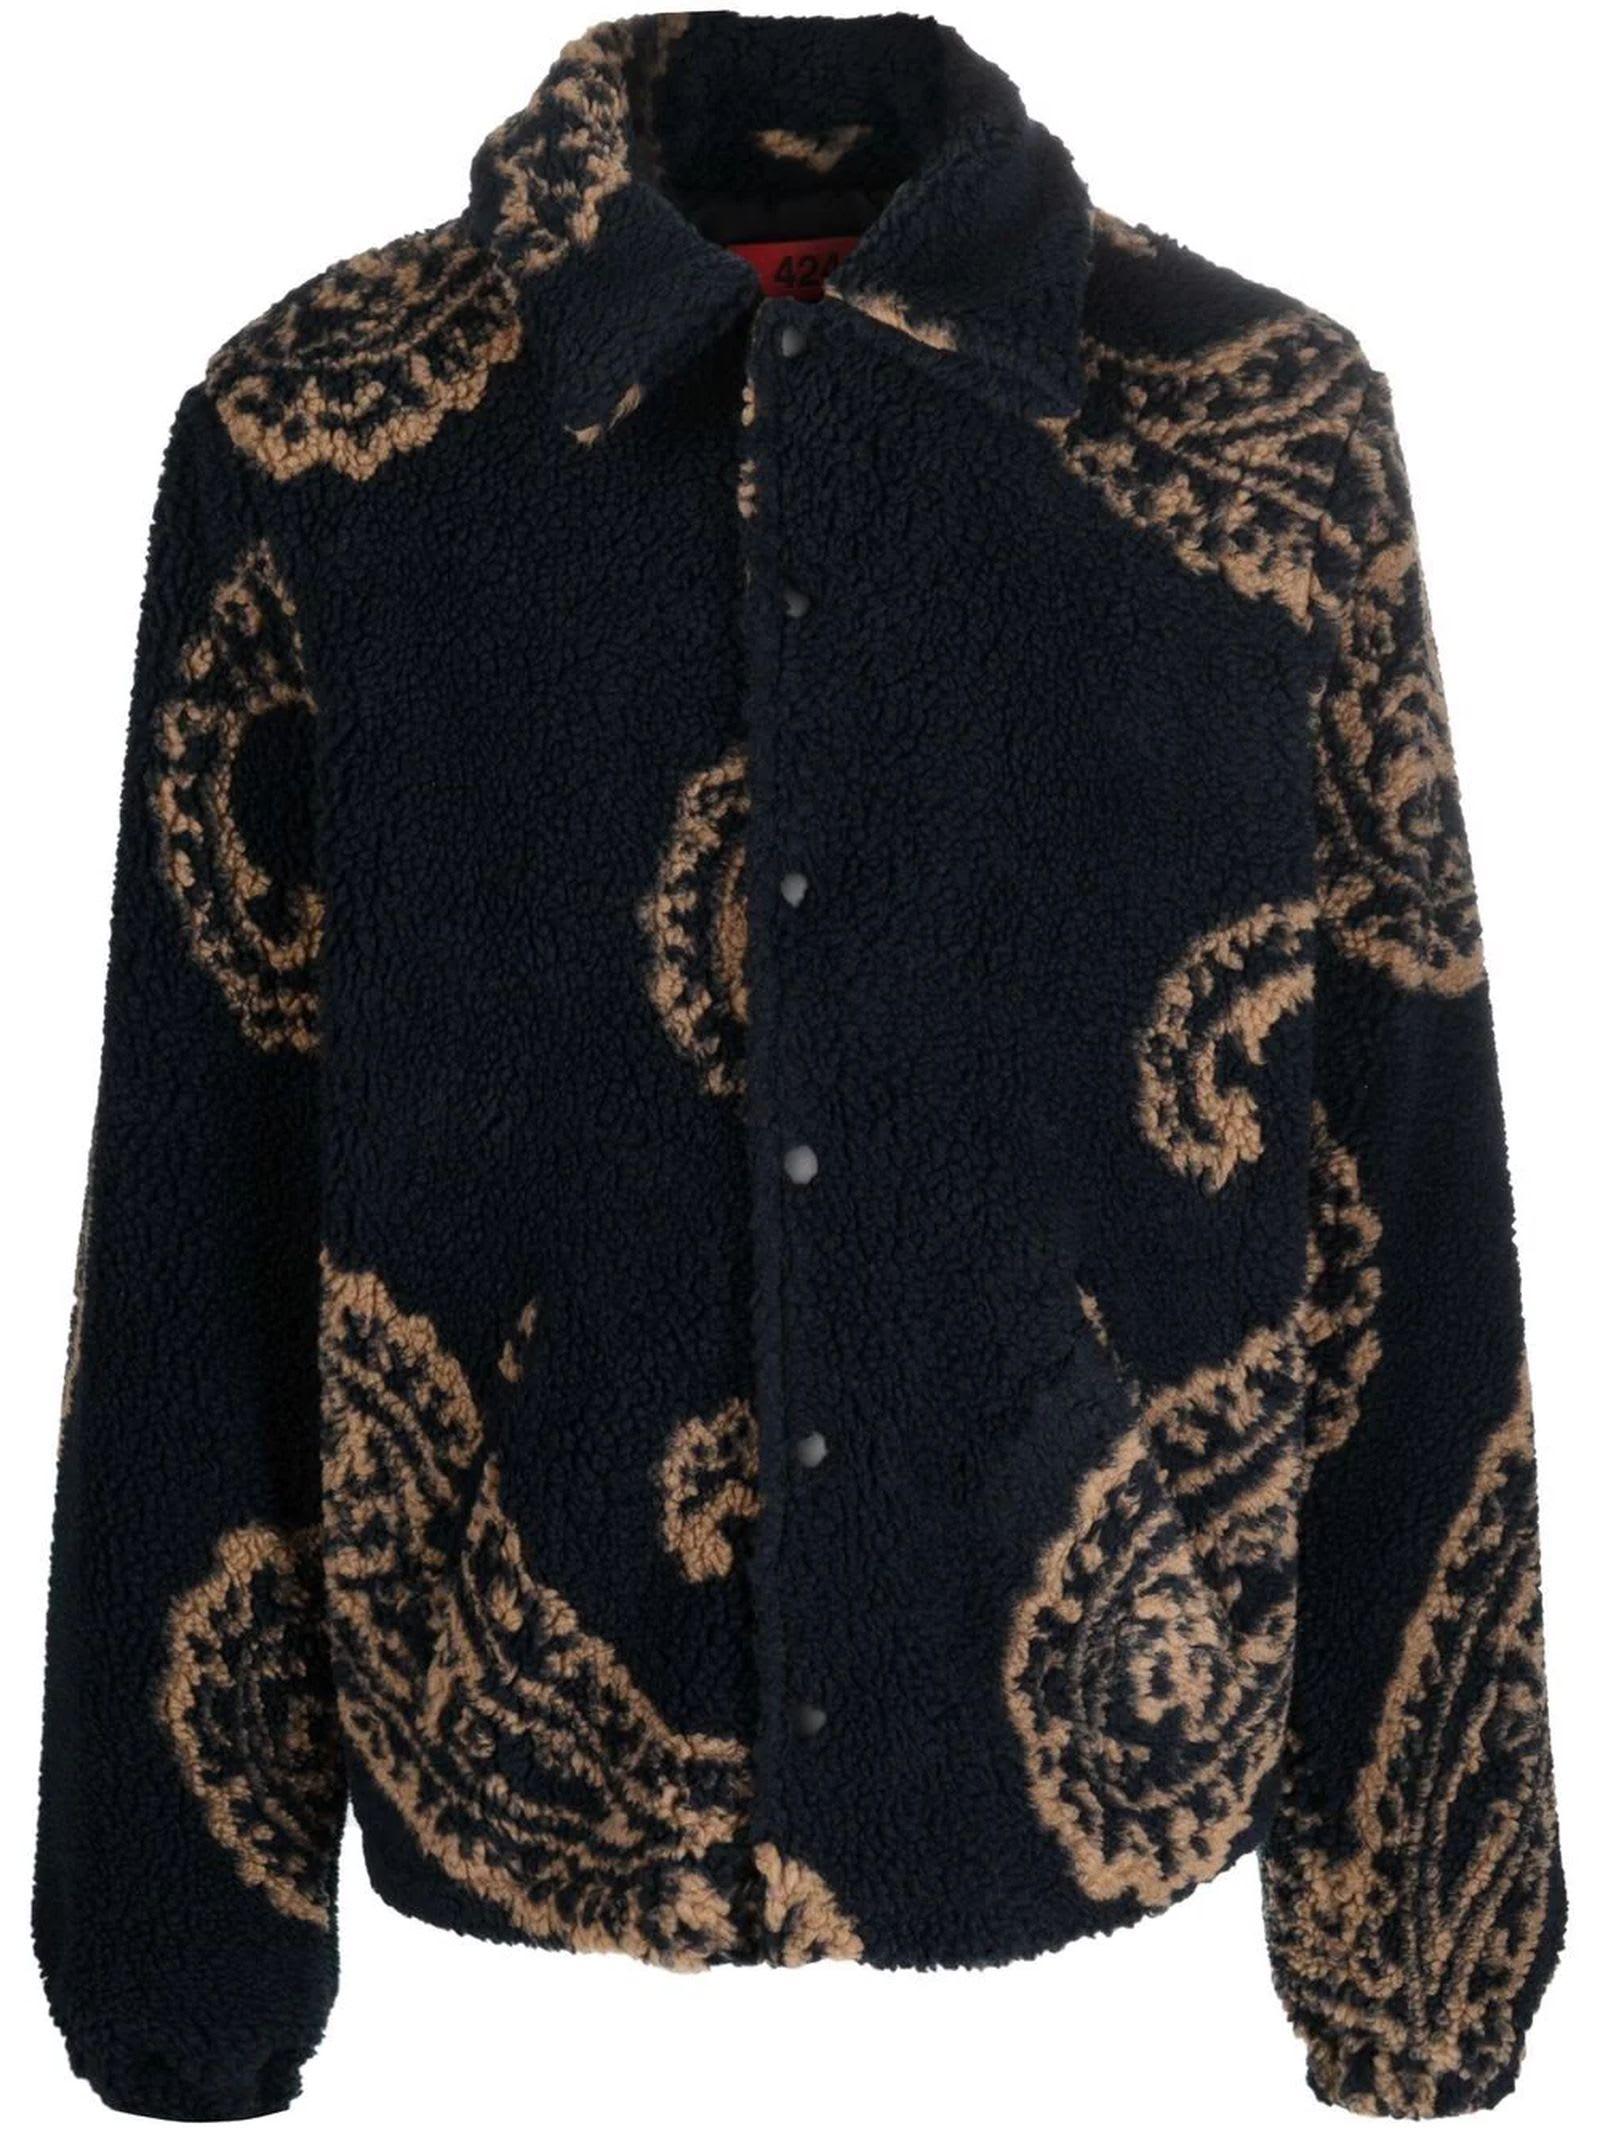 Navy-blue Faux-shearling Jacket